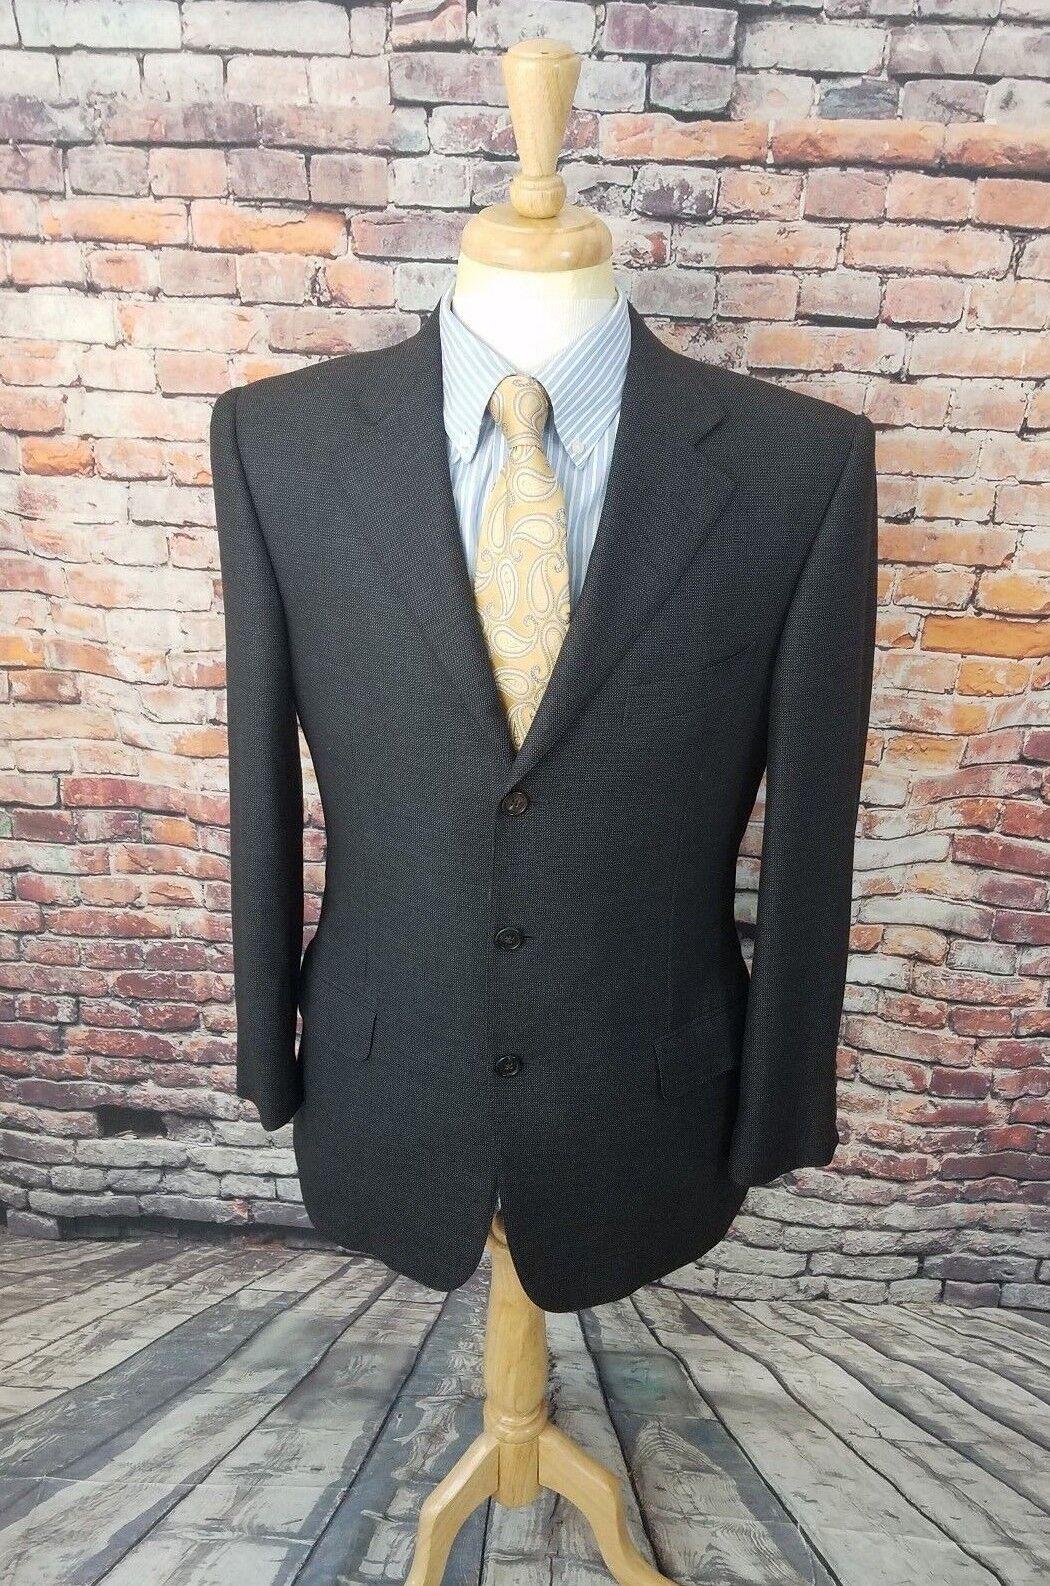 Ermenegildo Zegna 15 Milmil 15 ITALY 40R Grey Birds Eye Wool Sport Coat Blazer